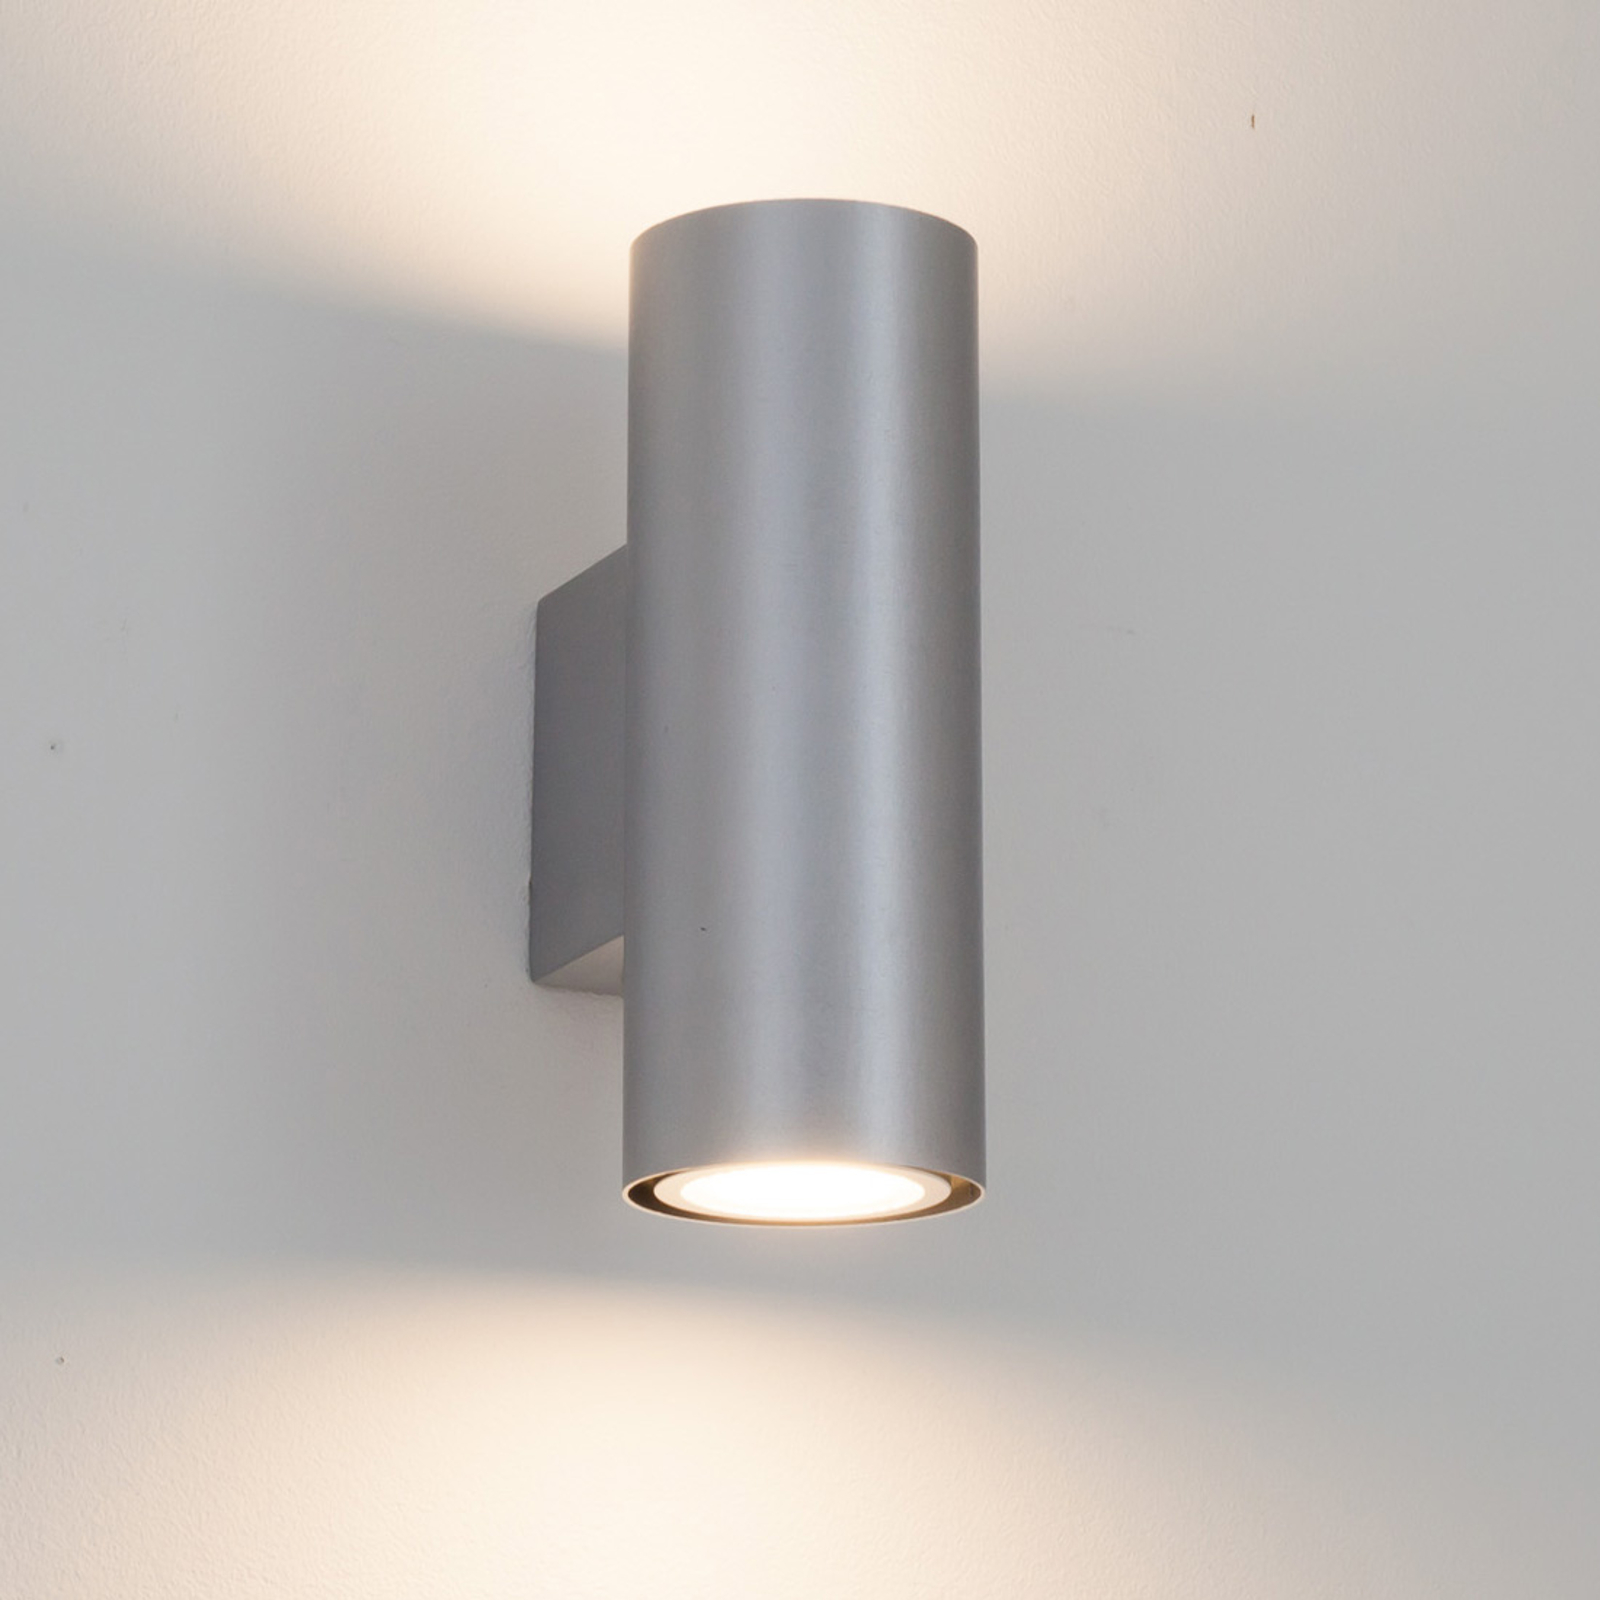 Silberne LED-Wandleuchte Kabir, 2-flammig